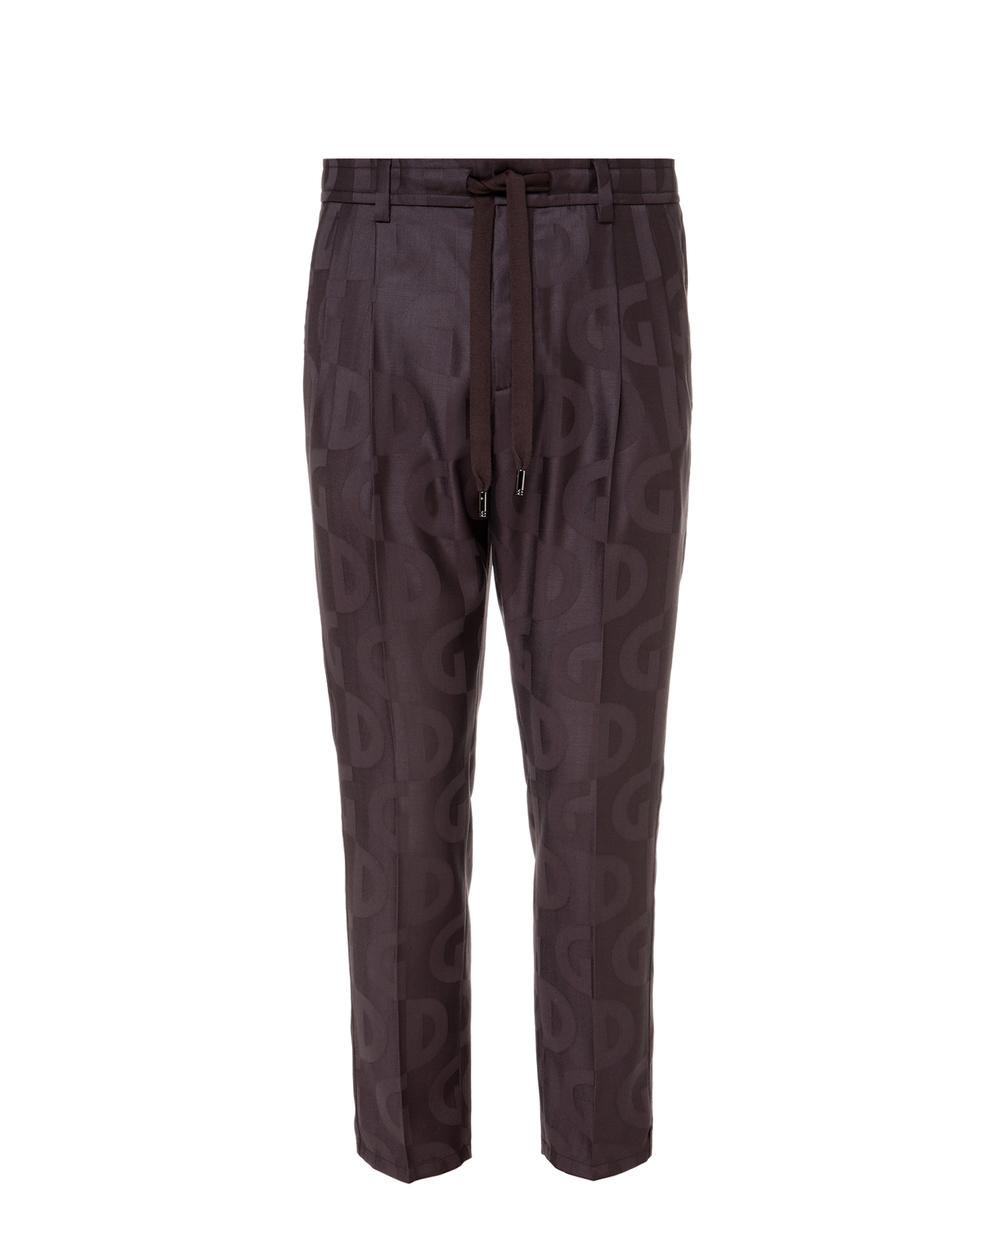 Шерстяные брюки Dolce&Gabbana GW08AT-FJ2B2 — Kameron